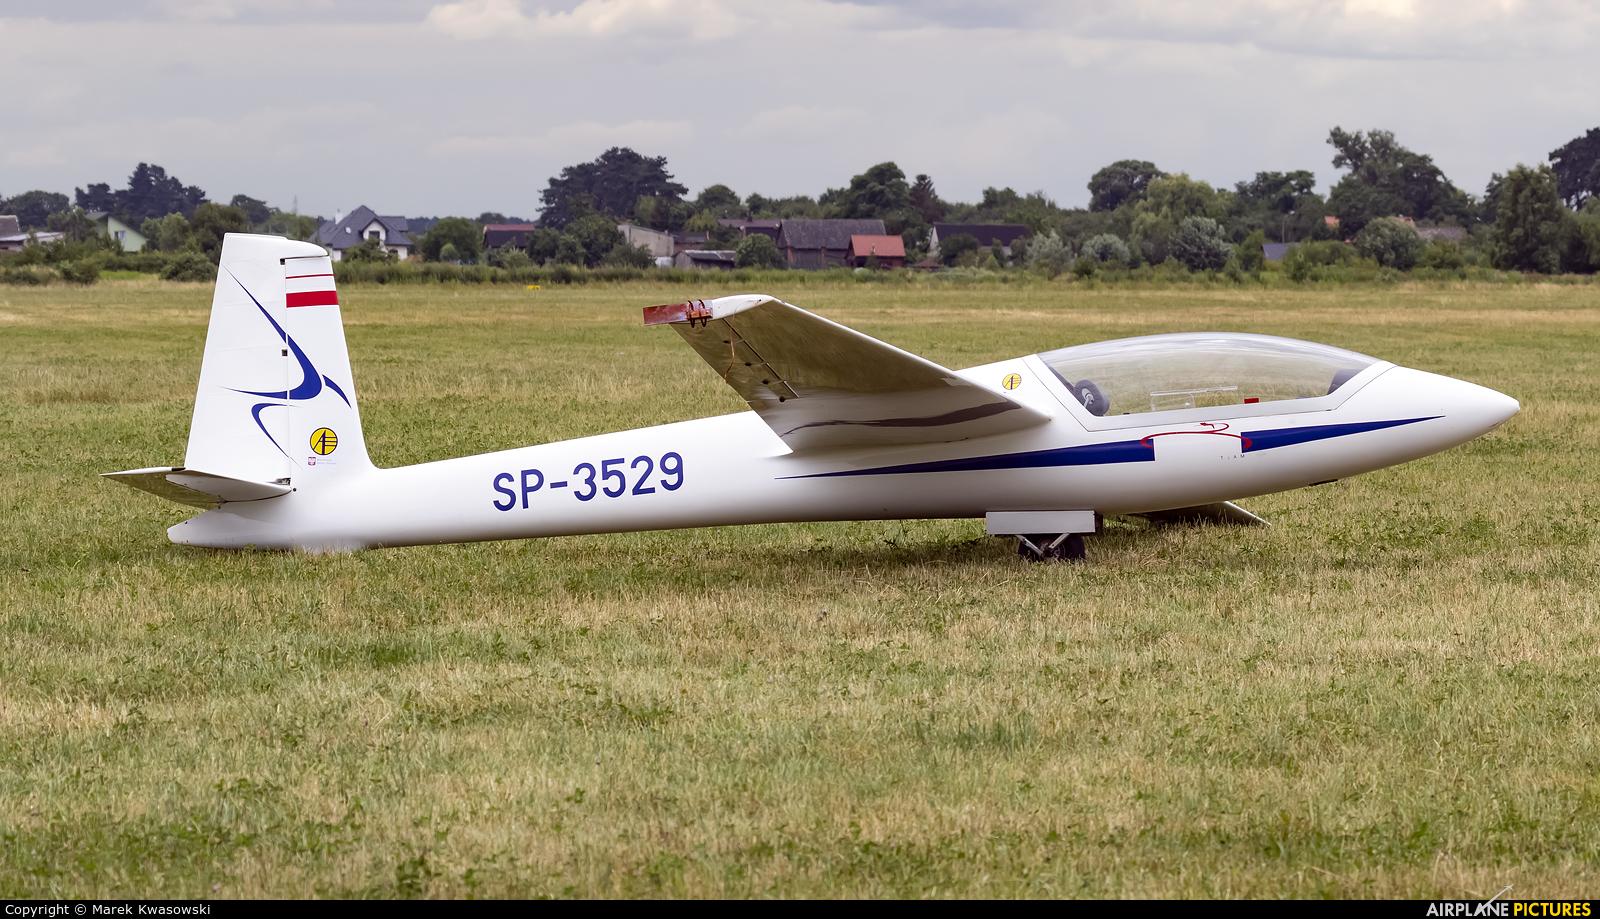 Aviomet Display Team SP-3529 aircraft at Piotrków Trybunalski